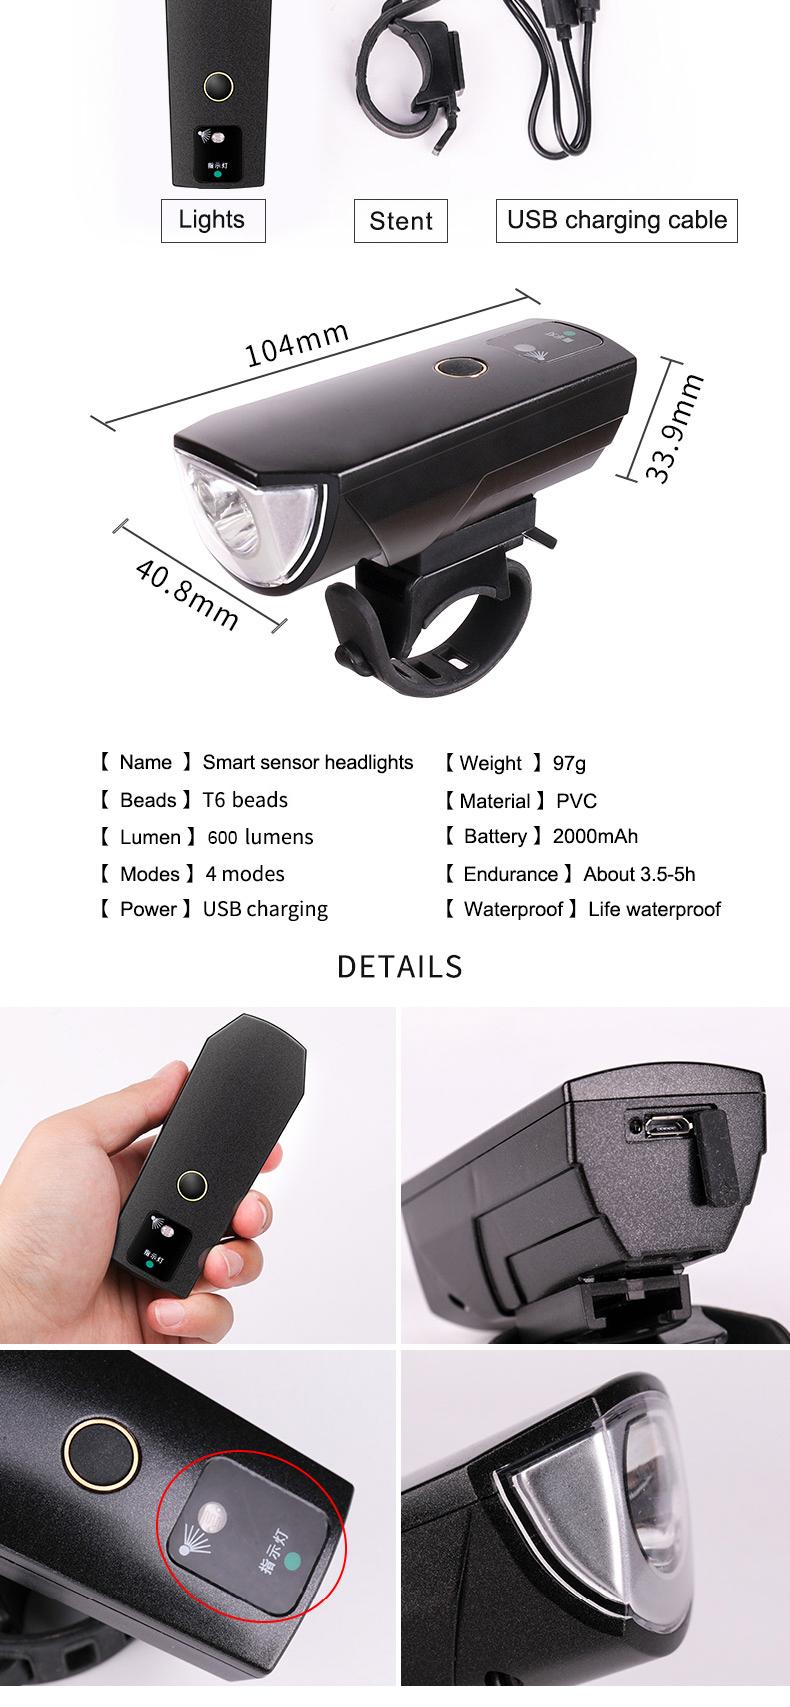 XANES SFL02 600LM T6 Smart Induction Bicycle Light IPX4 USB Перезаряжаемый 80 ° Большой прожектор - фото 4